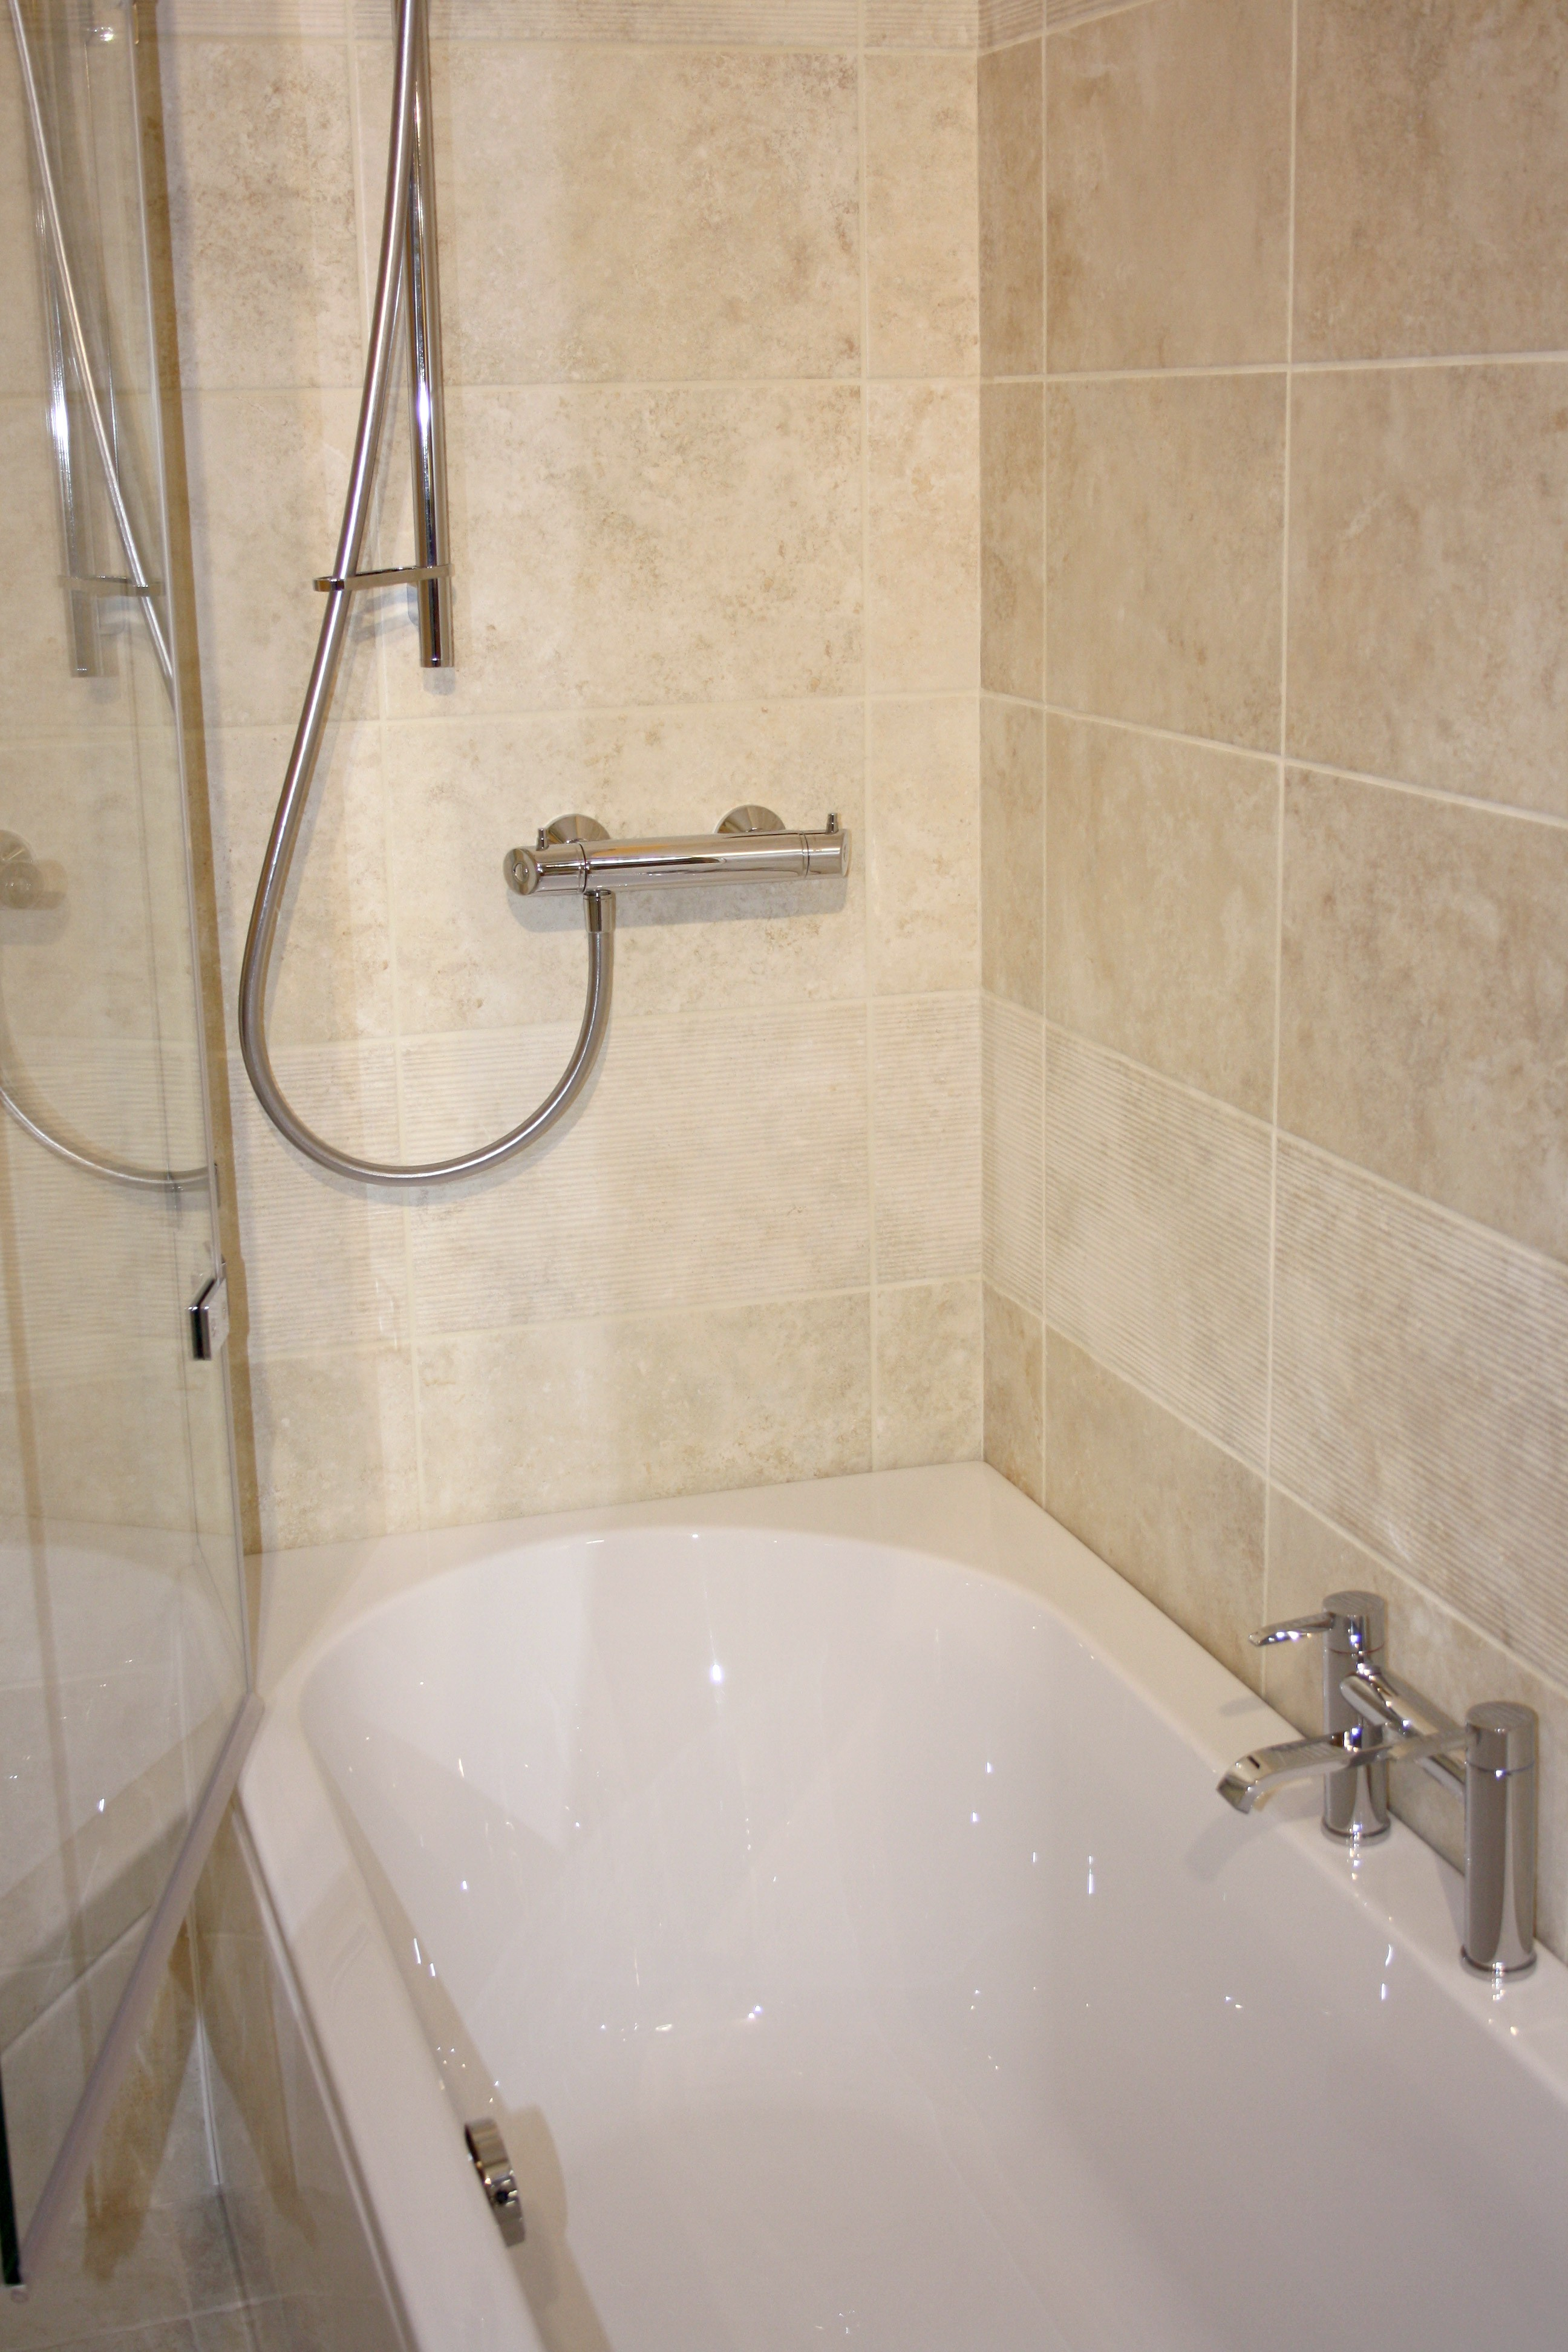 Bathroom Tiles Images. Quantocks Stone Effect Tiles Bathroom Images ...